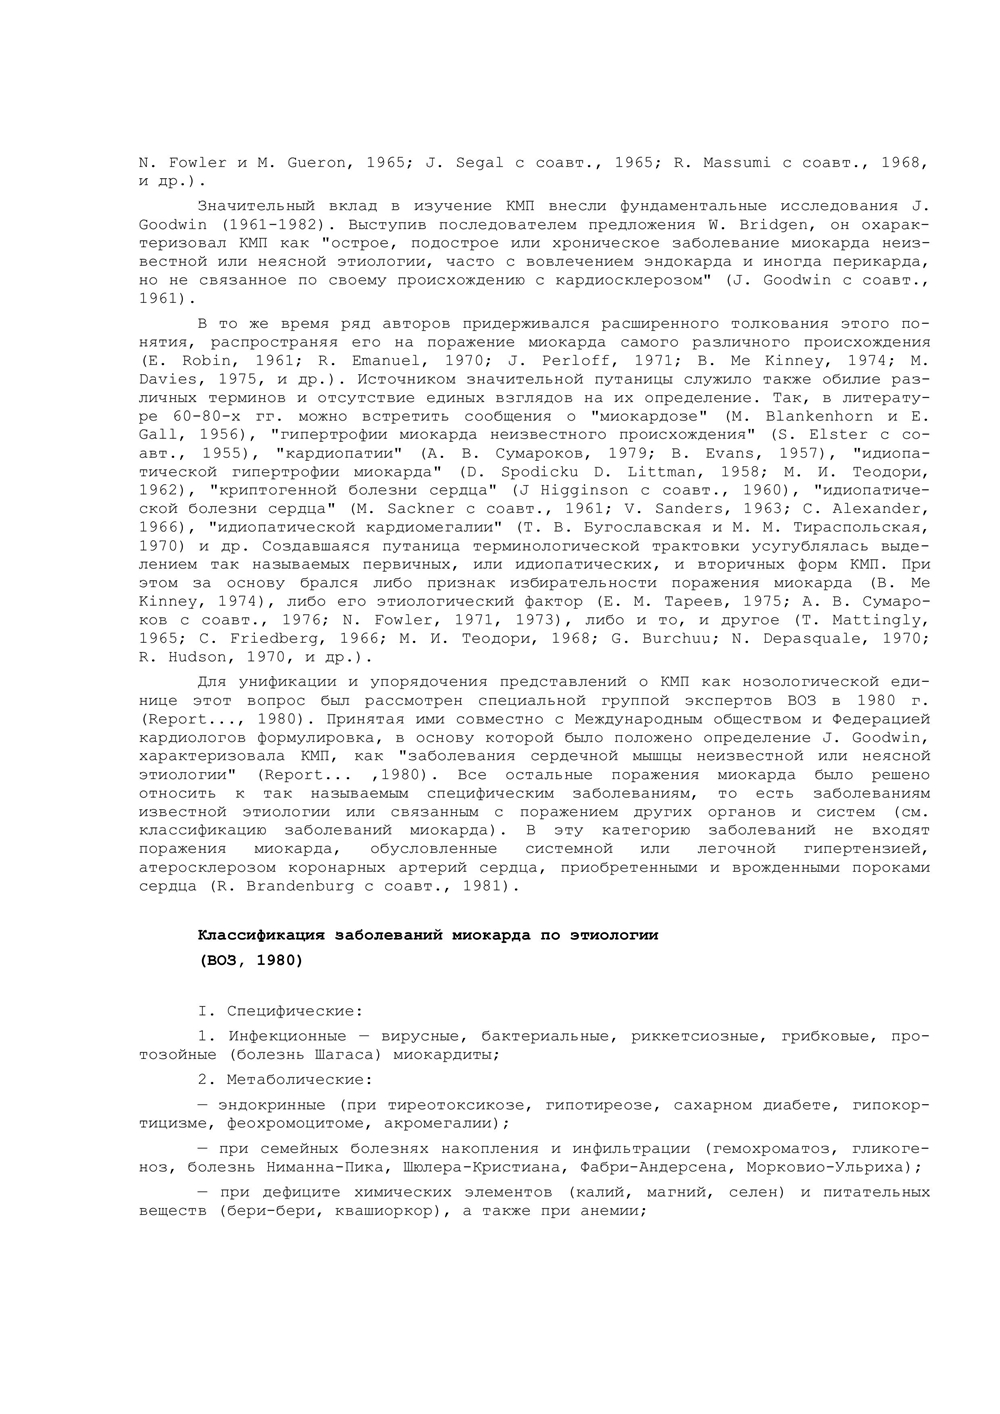 http://ipic.su/img/img7/fs/AmosovaE.1591778285.jpg